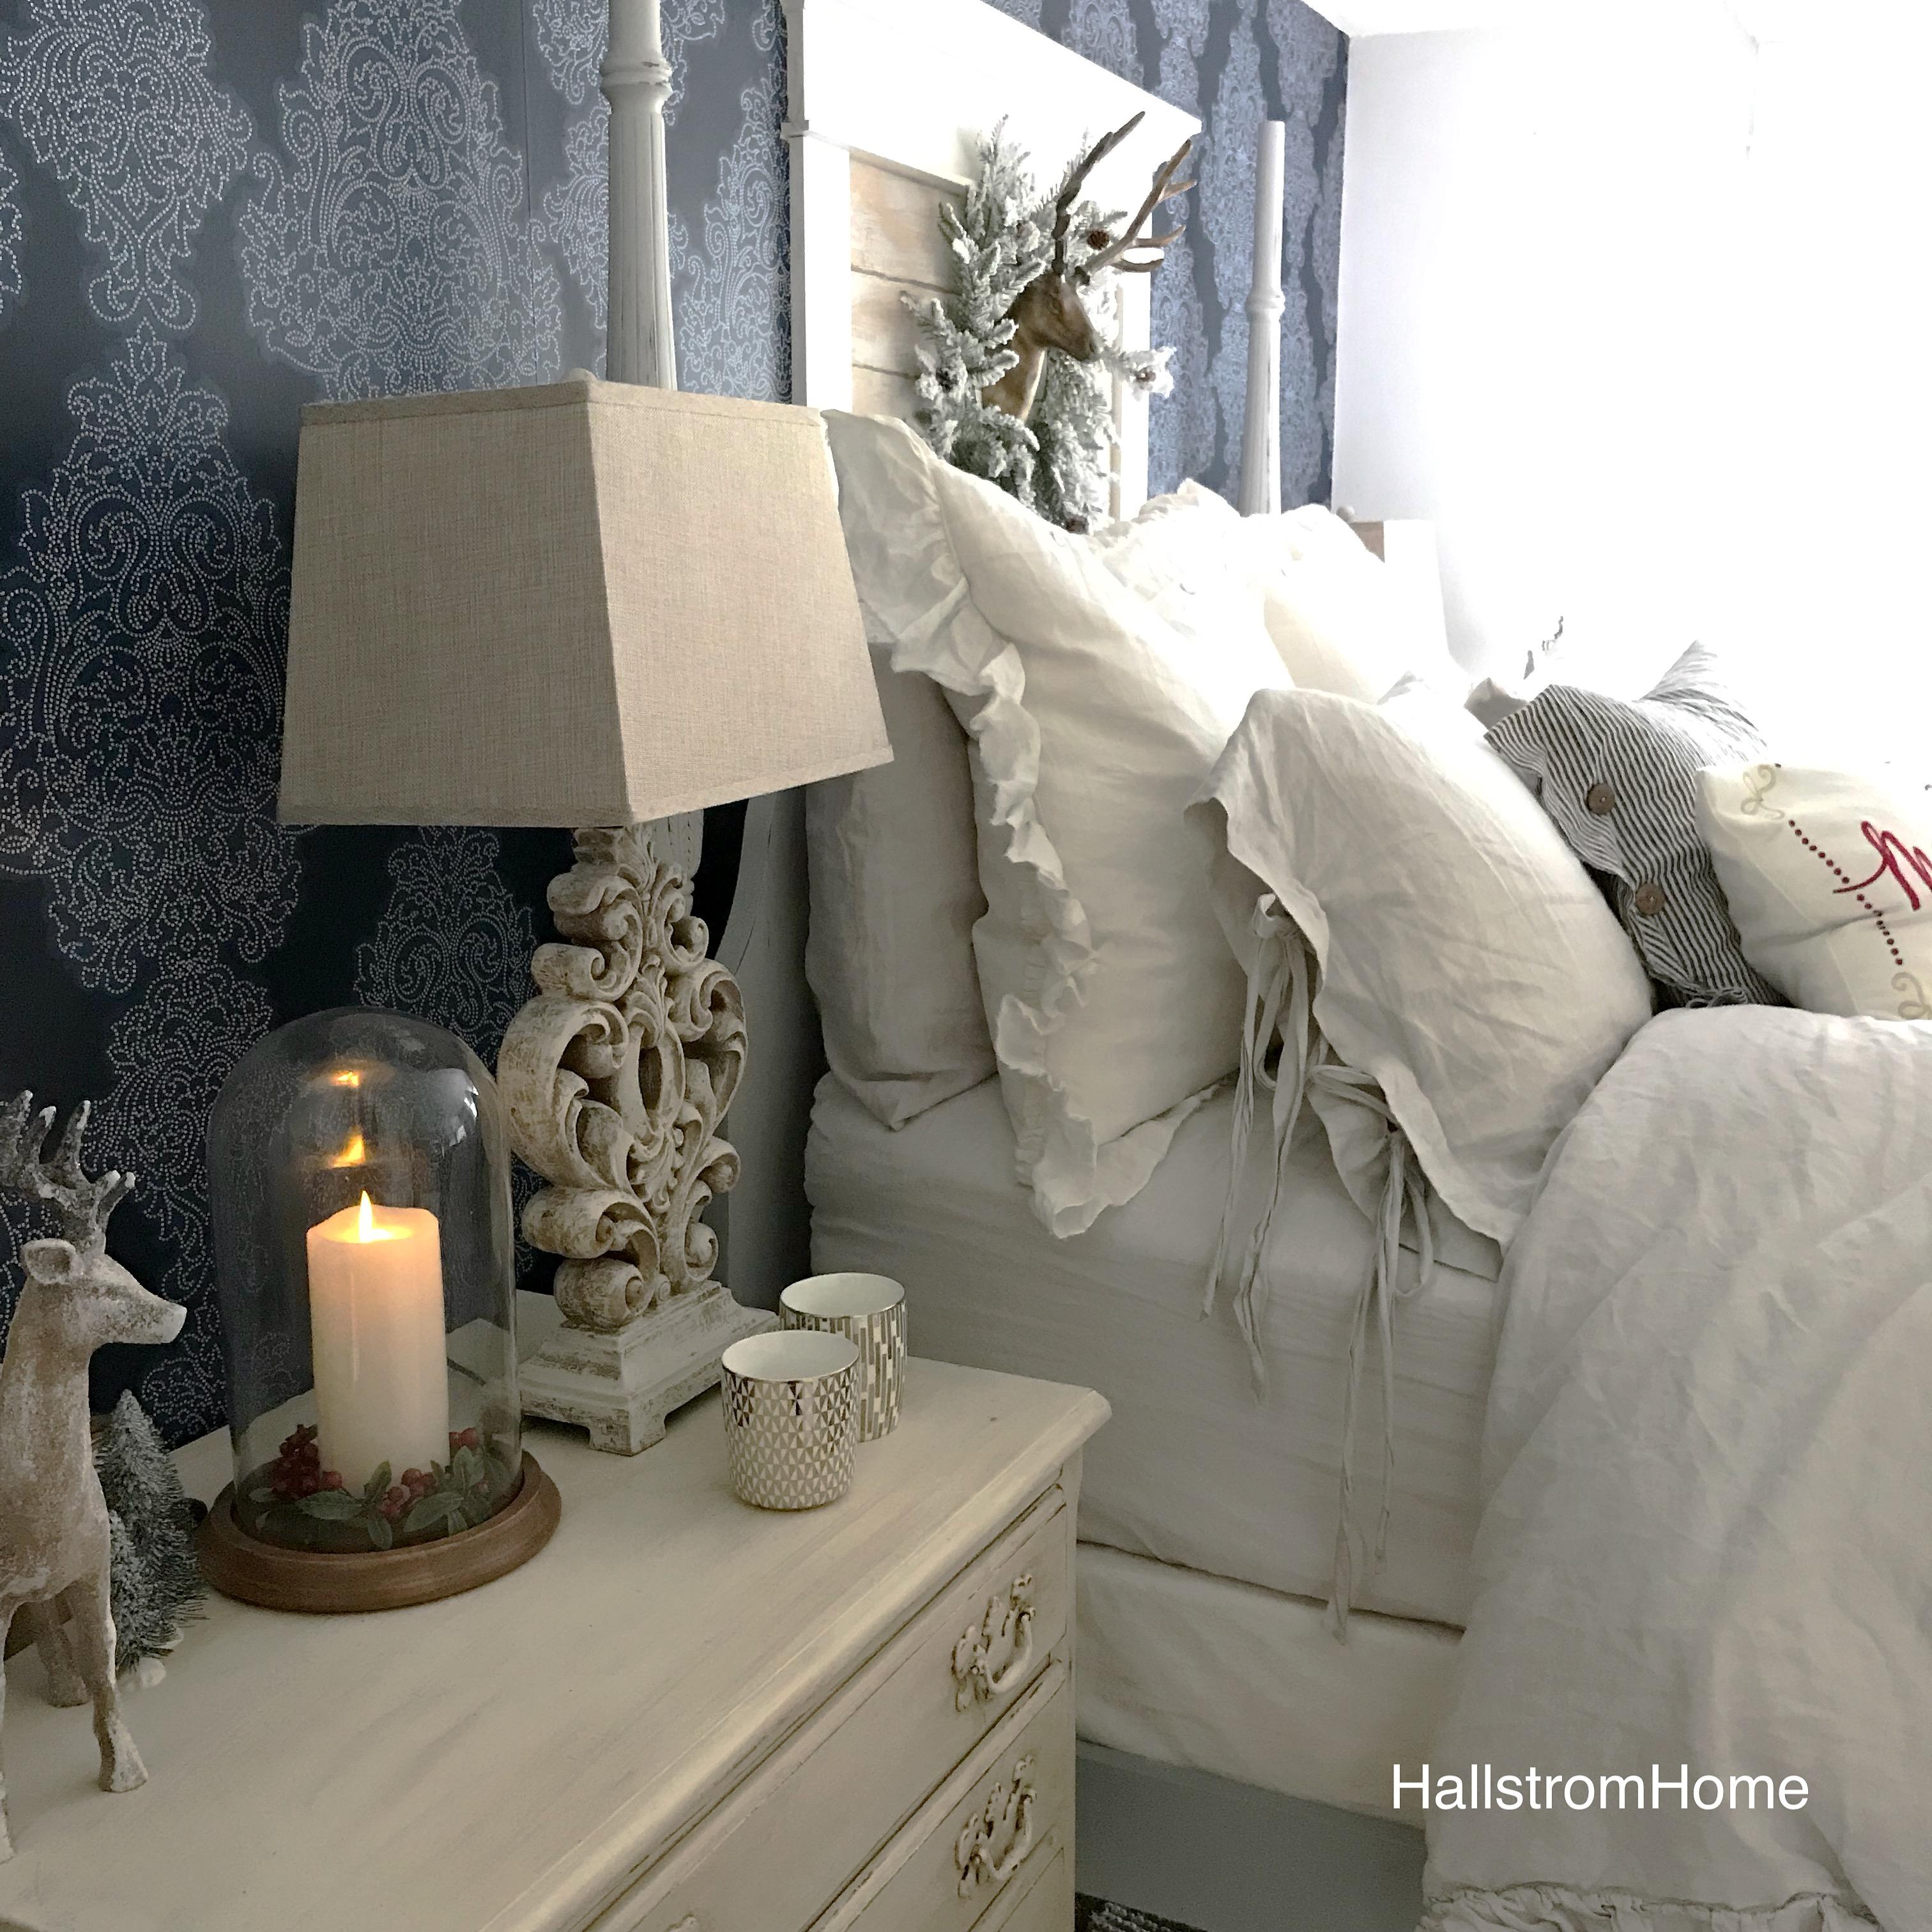 Cozy Christmas Farmhouse Bedroom Tour